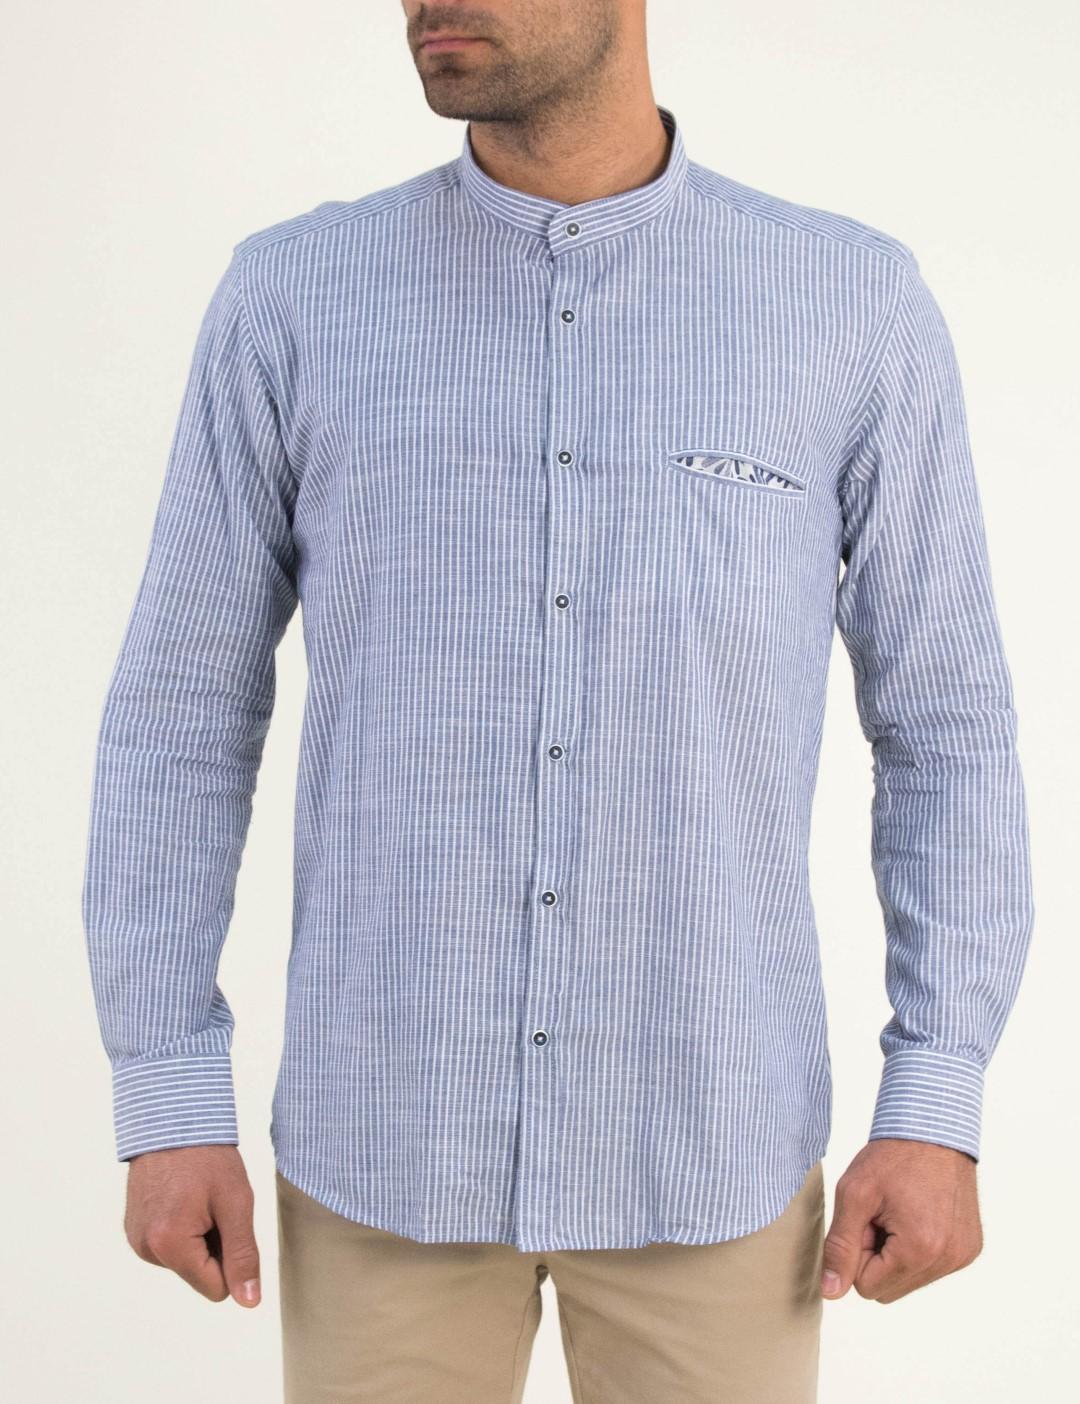 11328d92ed3d Ανδρικό μπλε πουκάμισο ριγέ Firenze 0195107F